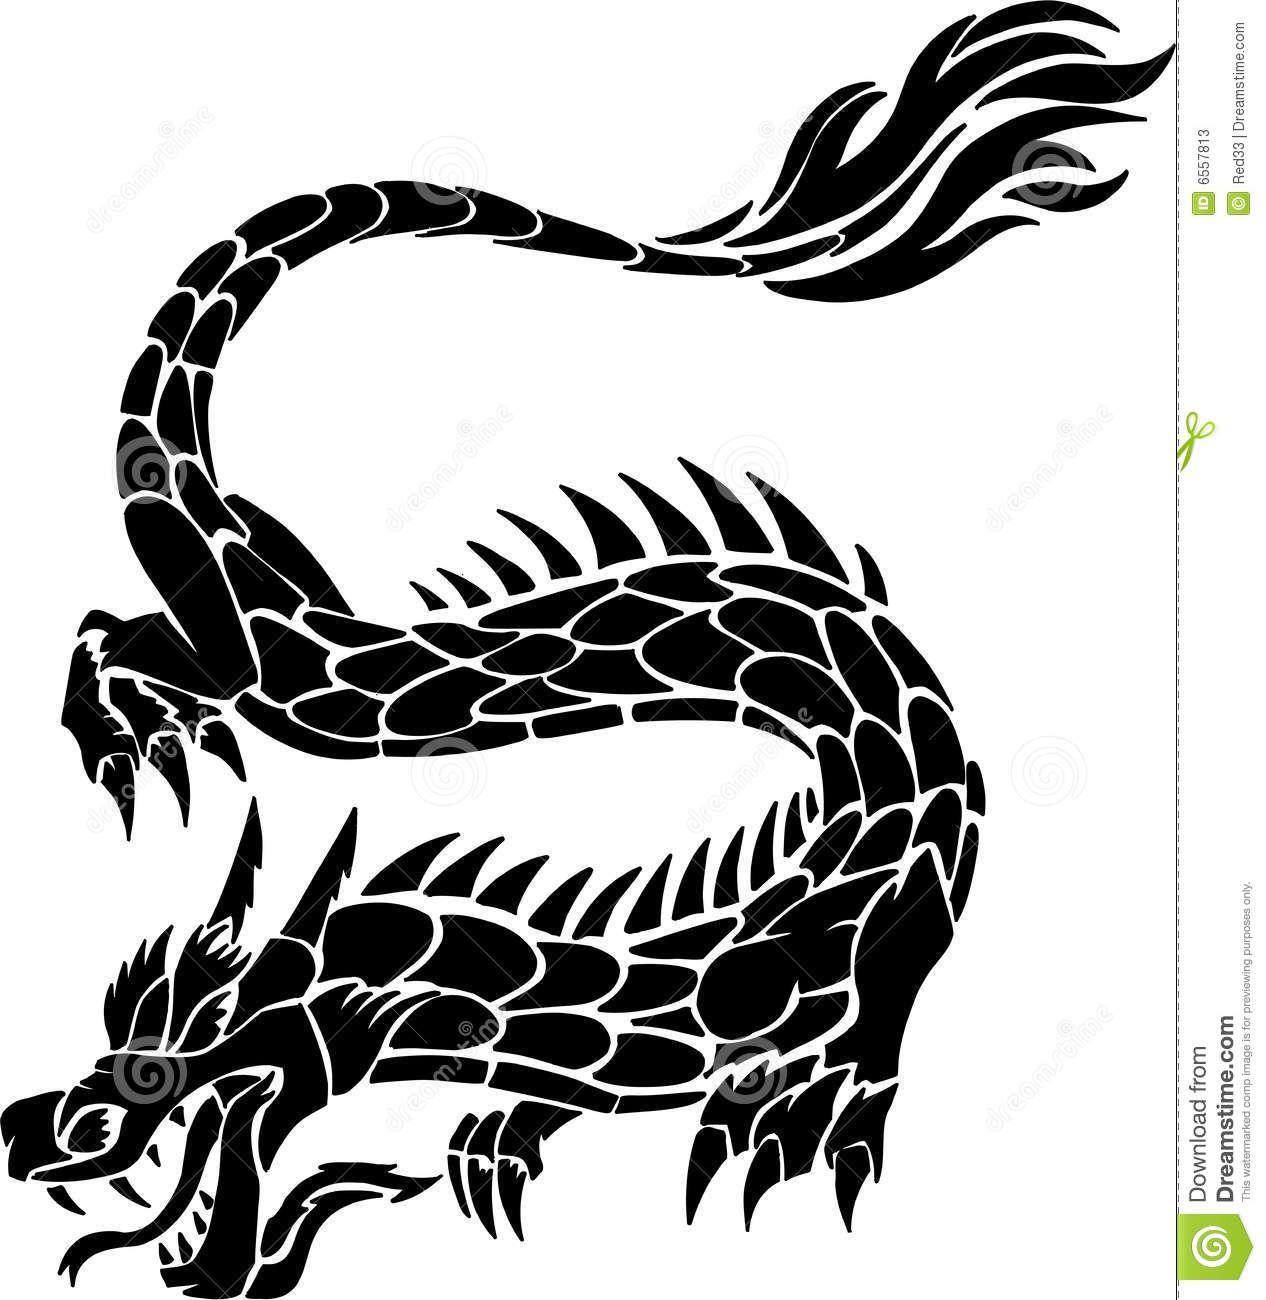 tatouage de dragon tribal photos stock image 6557813. Black Bedroom Furniture Sets. Home Design Ideas